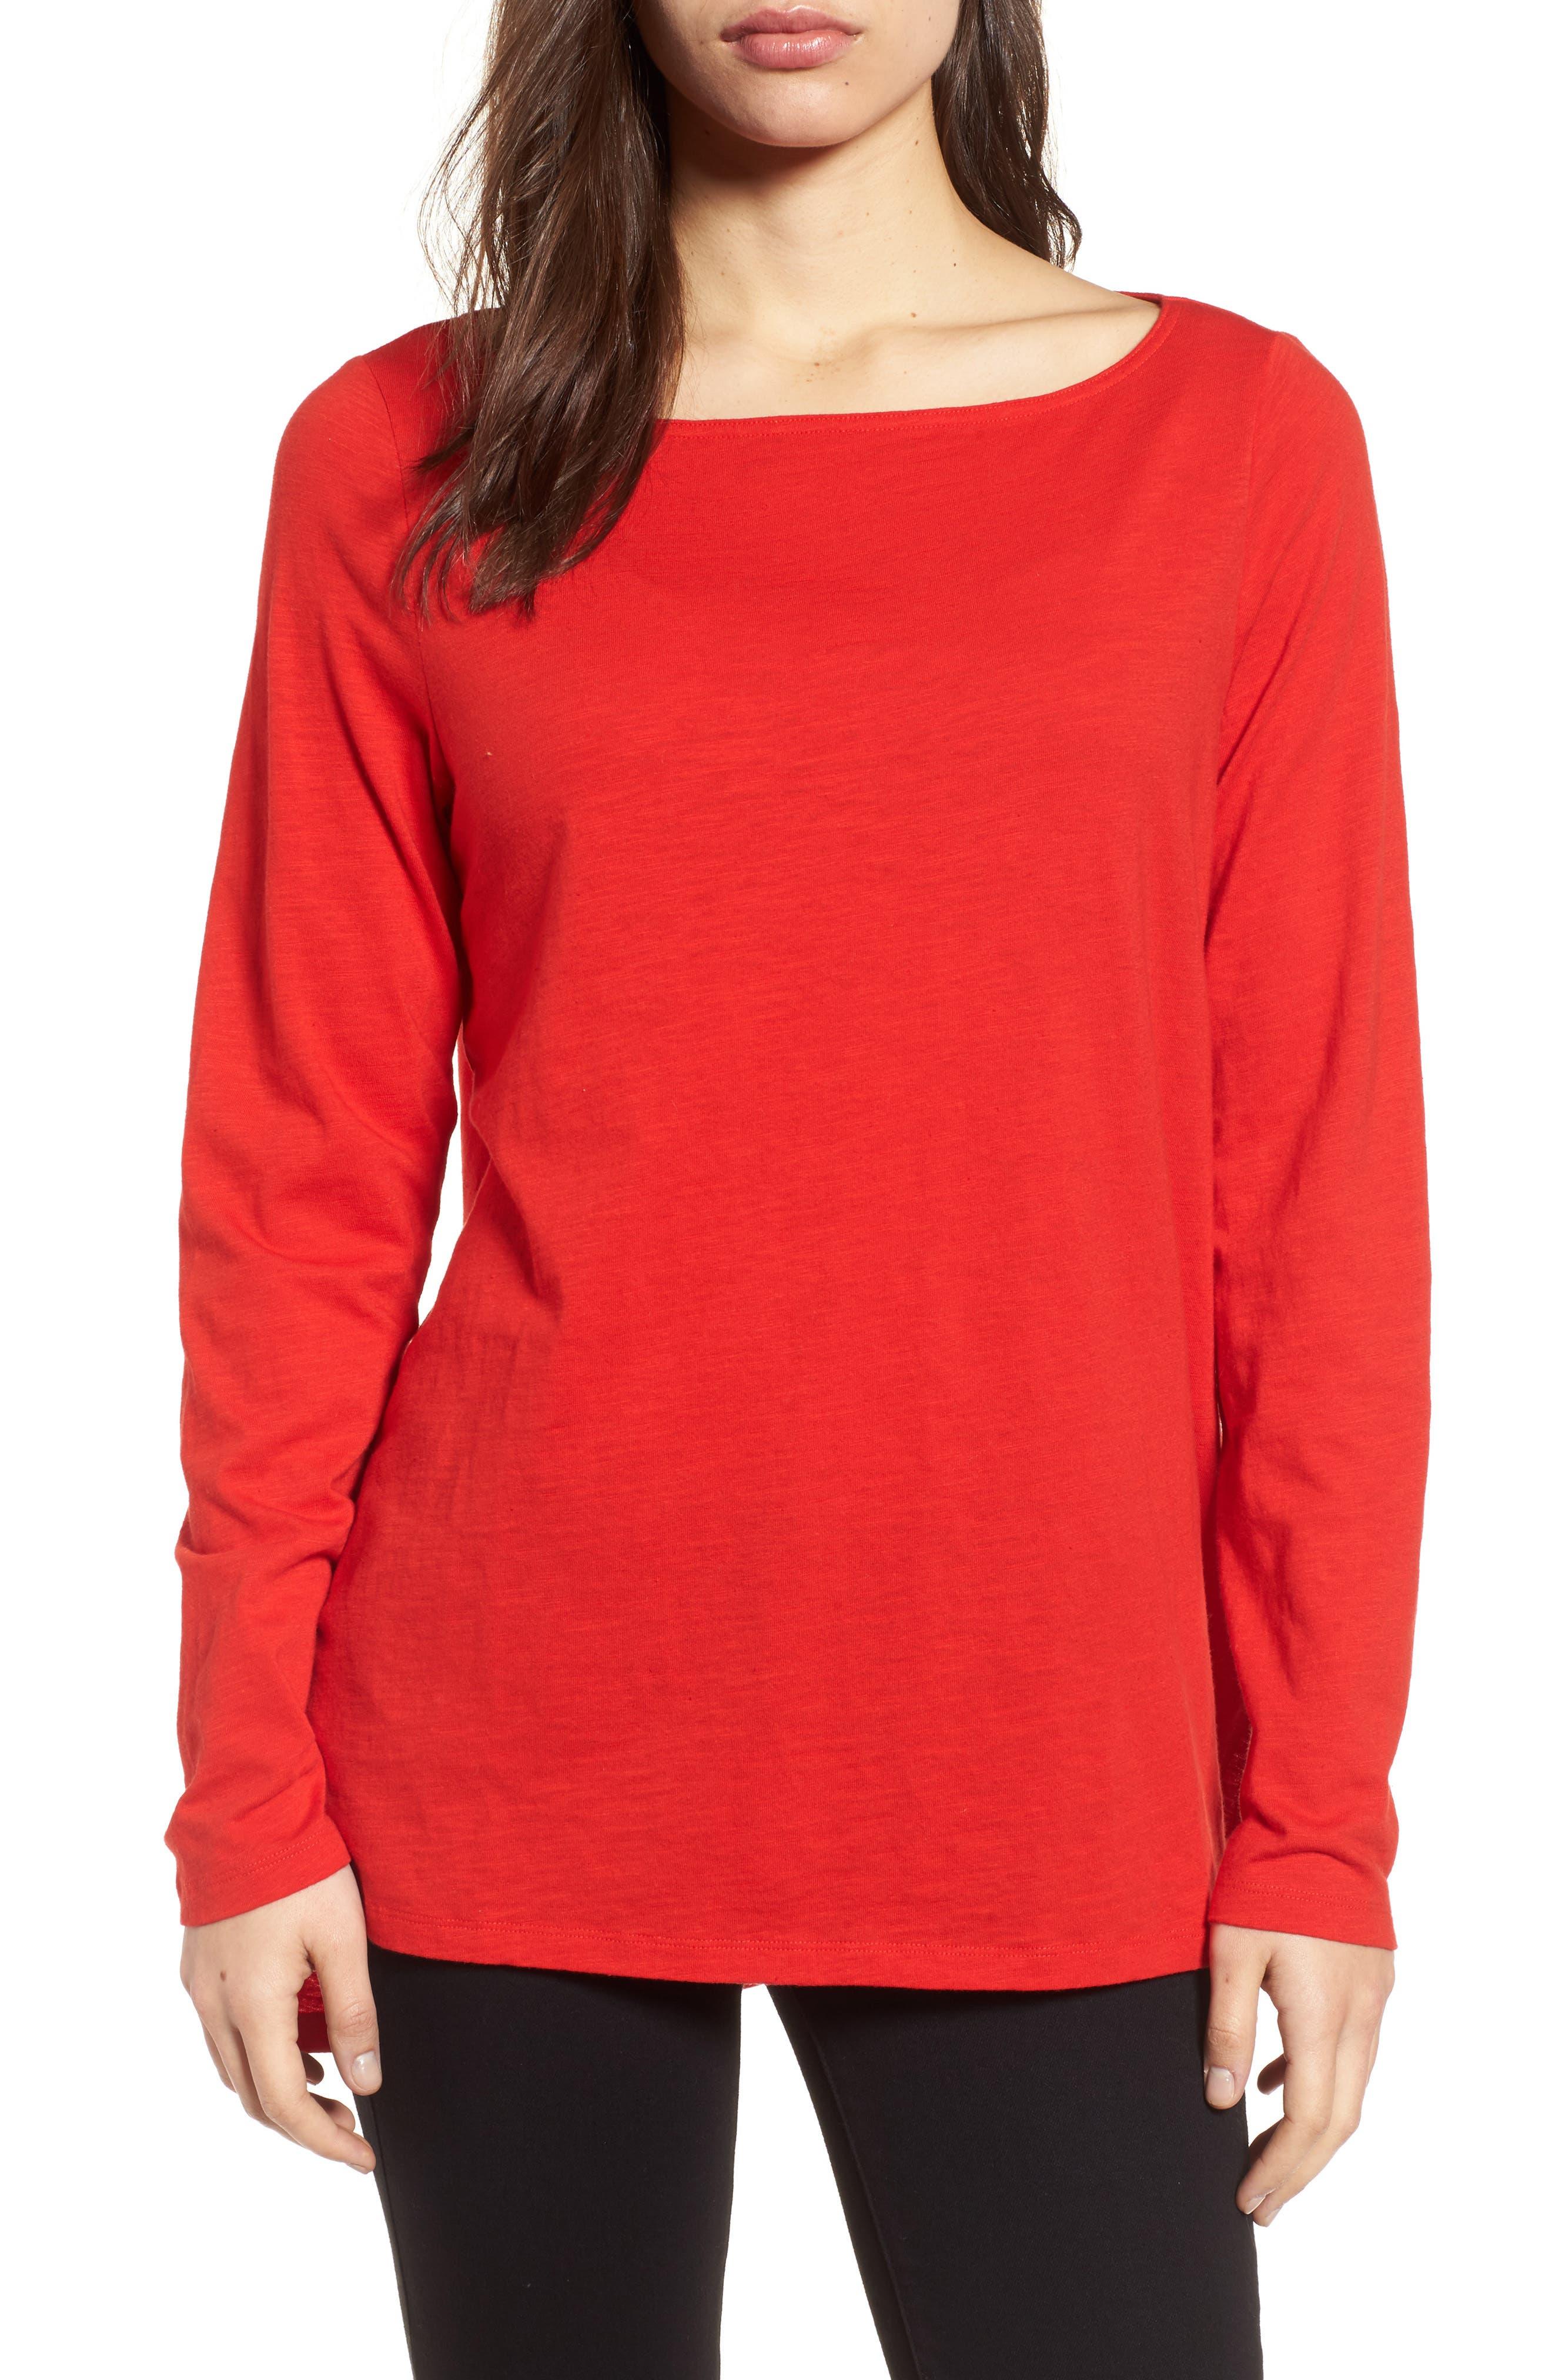 Eileen Fisher Bateau Neck Top (Regular & Petite)